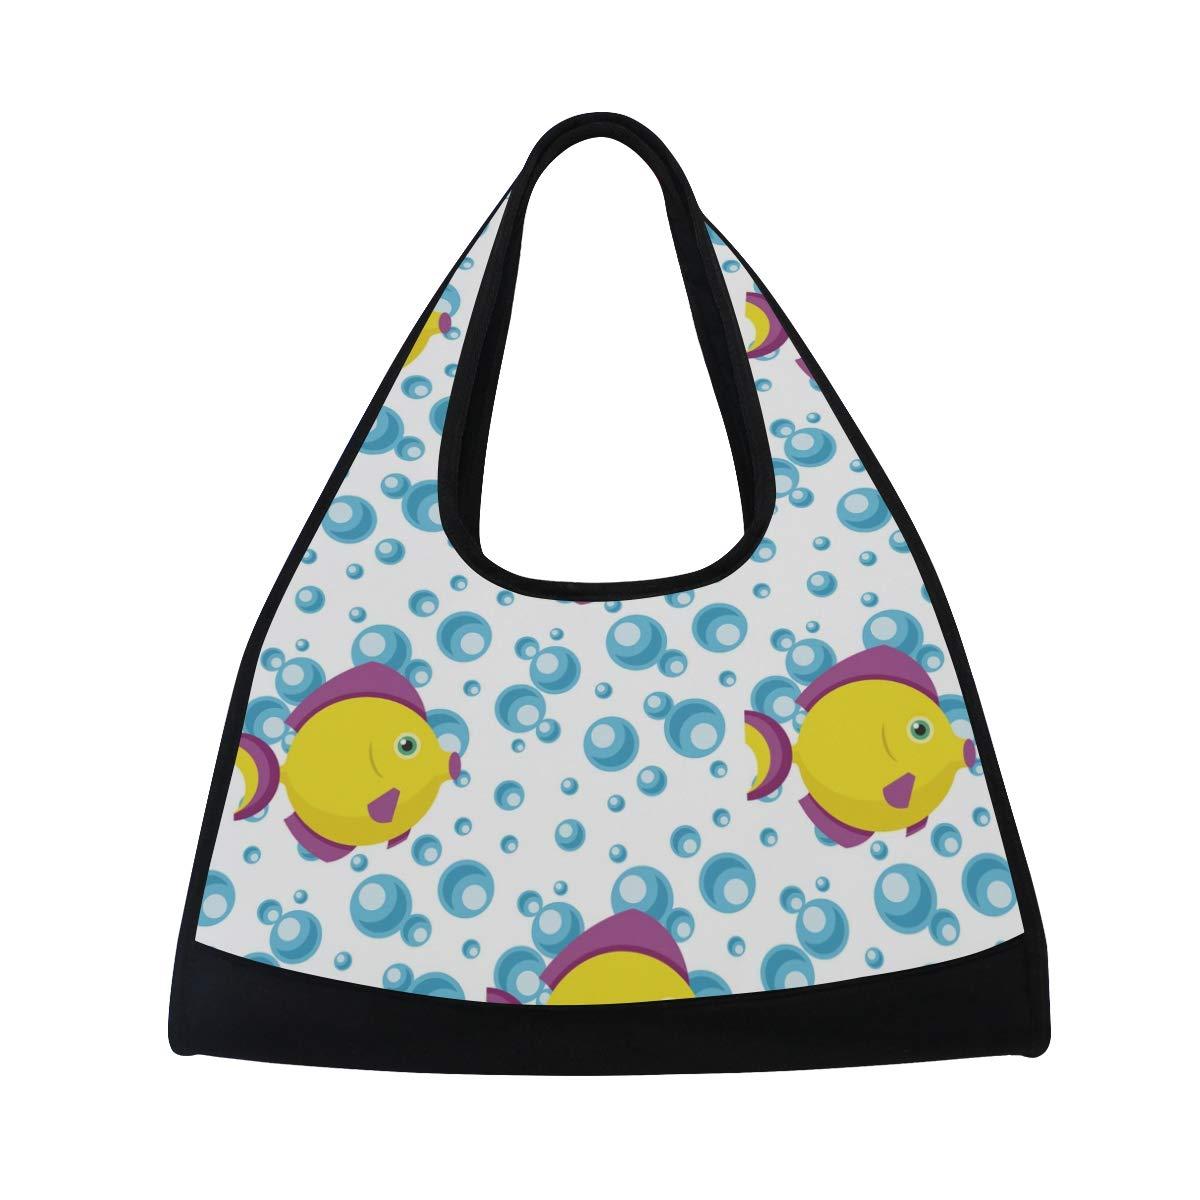 Unisex Travel Duffels Gym Bag Sea Fish Shell Canvas Weekender Bag Shoulder Bag Totes bags